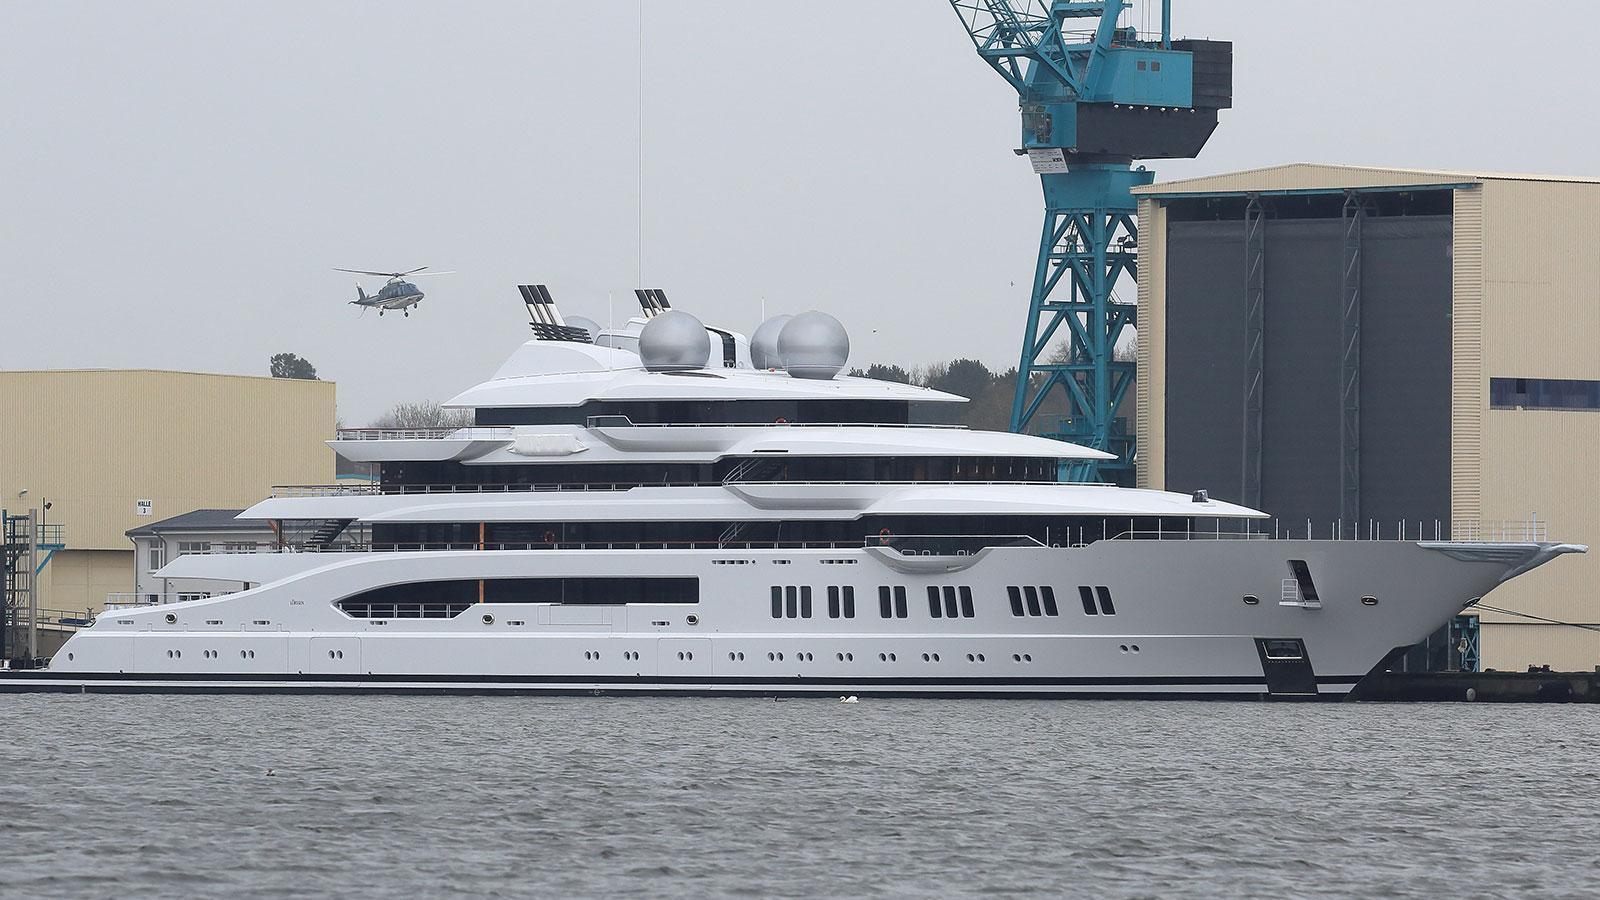 mistral-motor-yacht-lurssen-2016-106m-profile